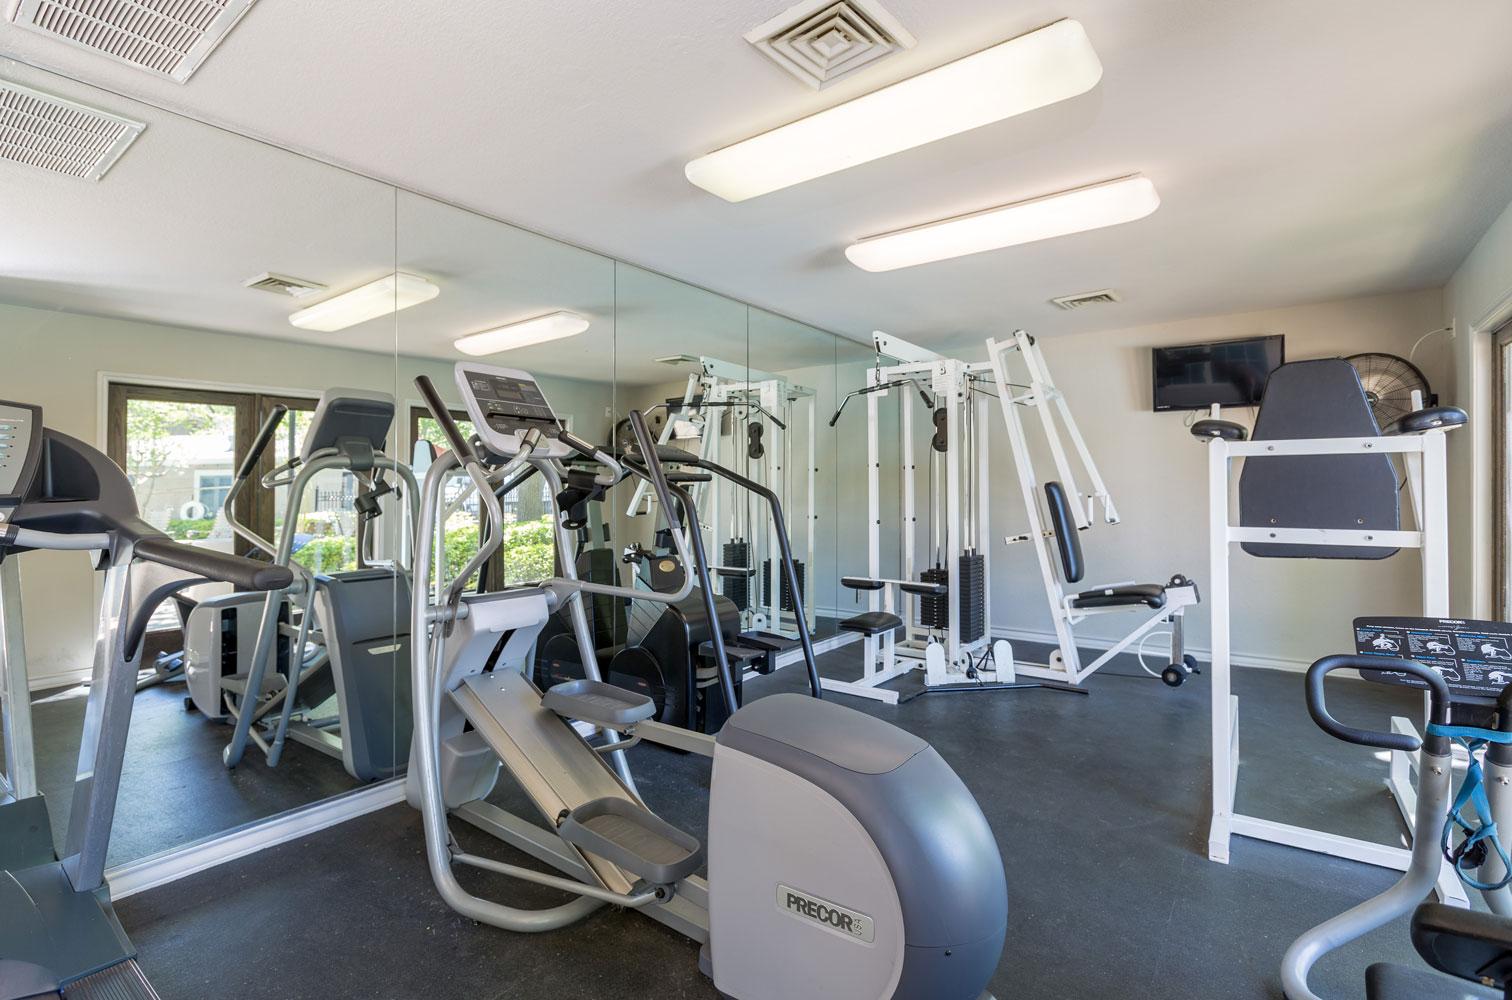 Gym Equipment at Sapphire Apartments in San Antonio, Texas